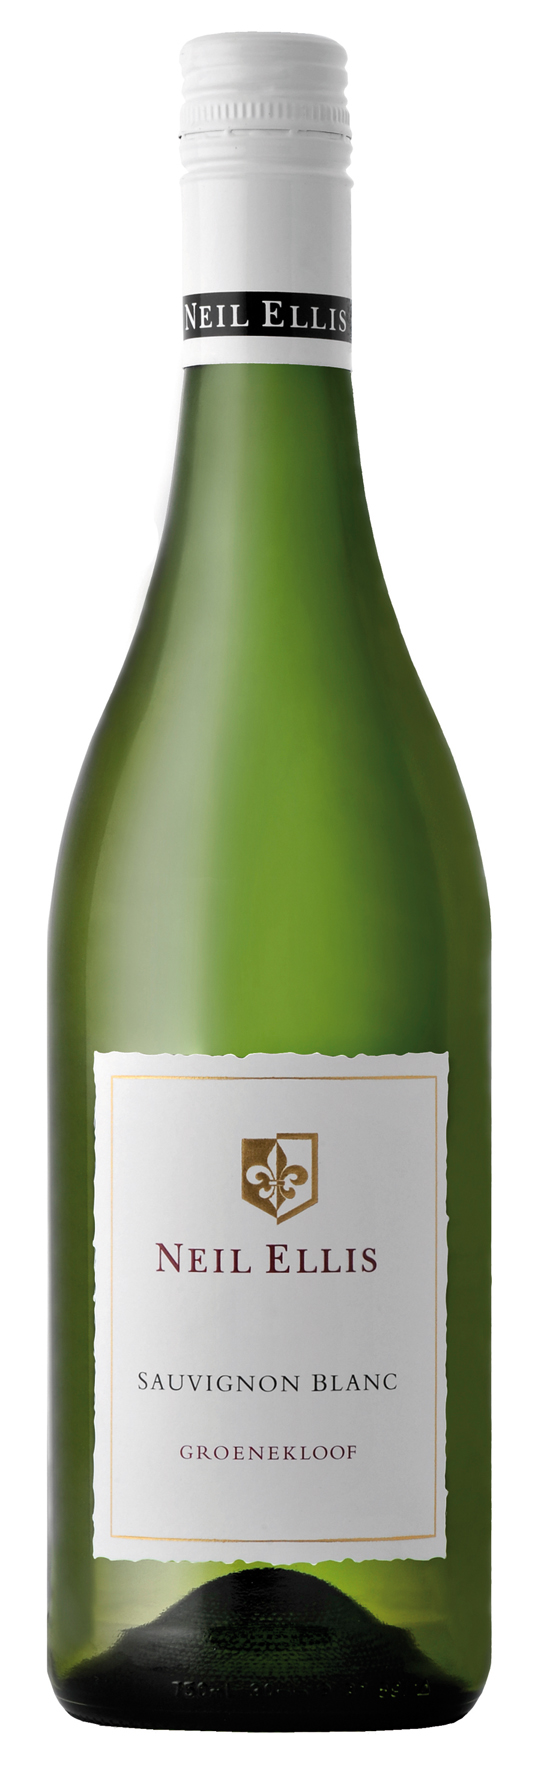 2016 Sauvignon Blanc - Groenekloof - Neil Ellis Stellenbosch